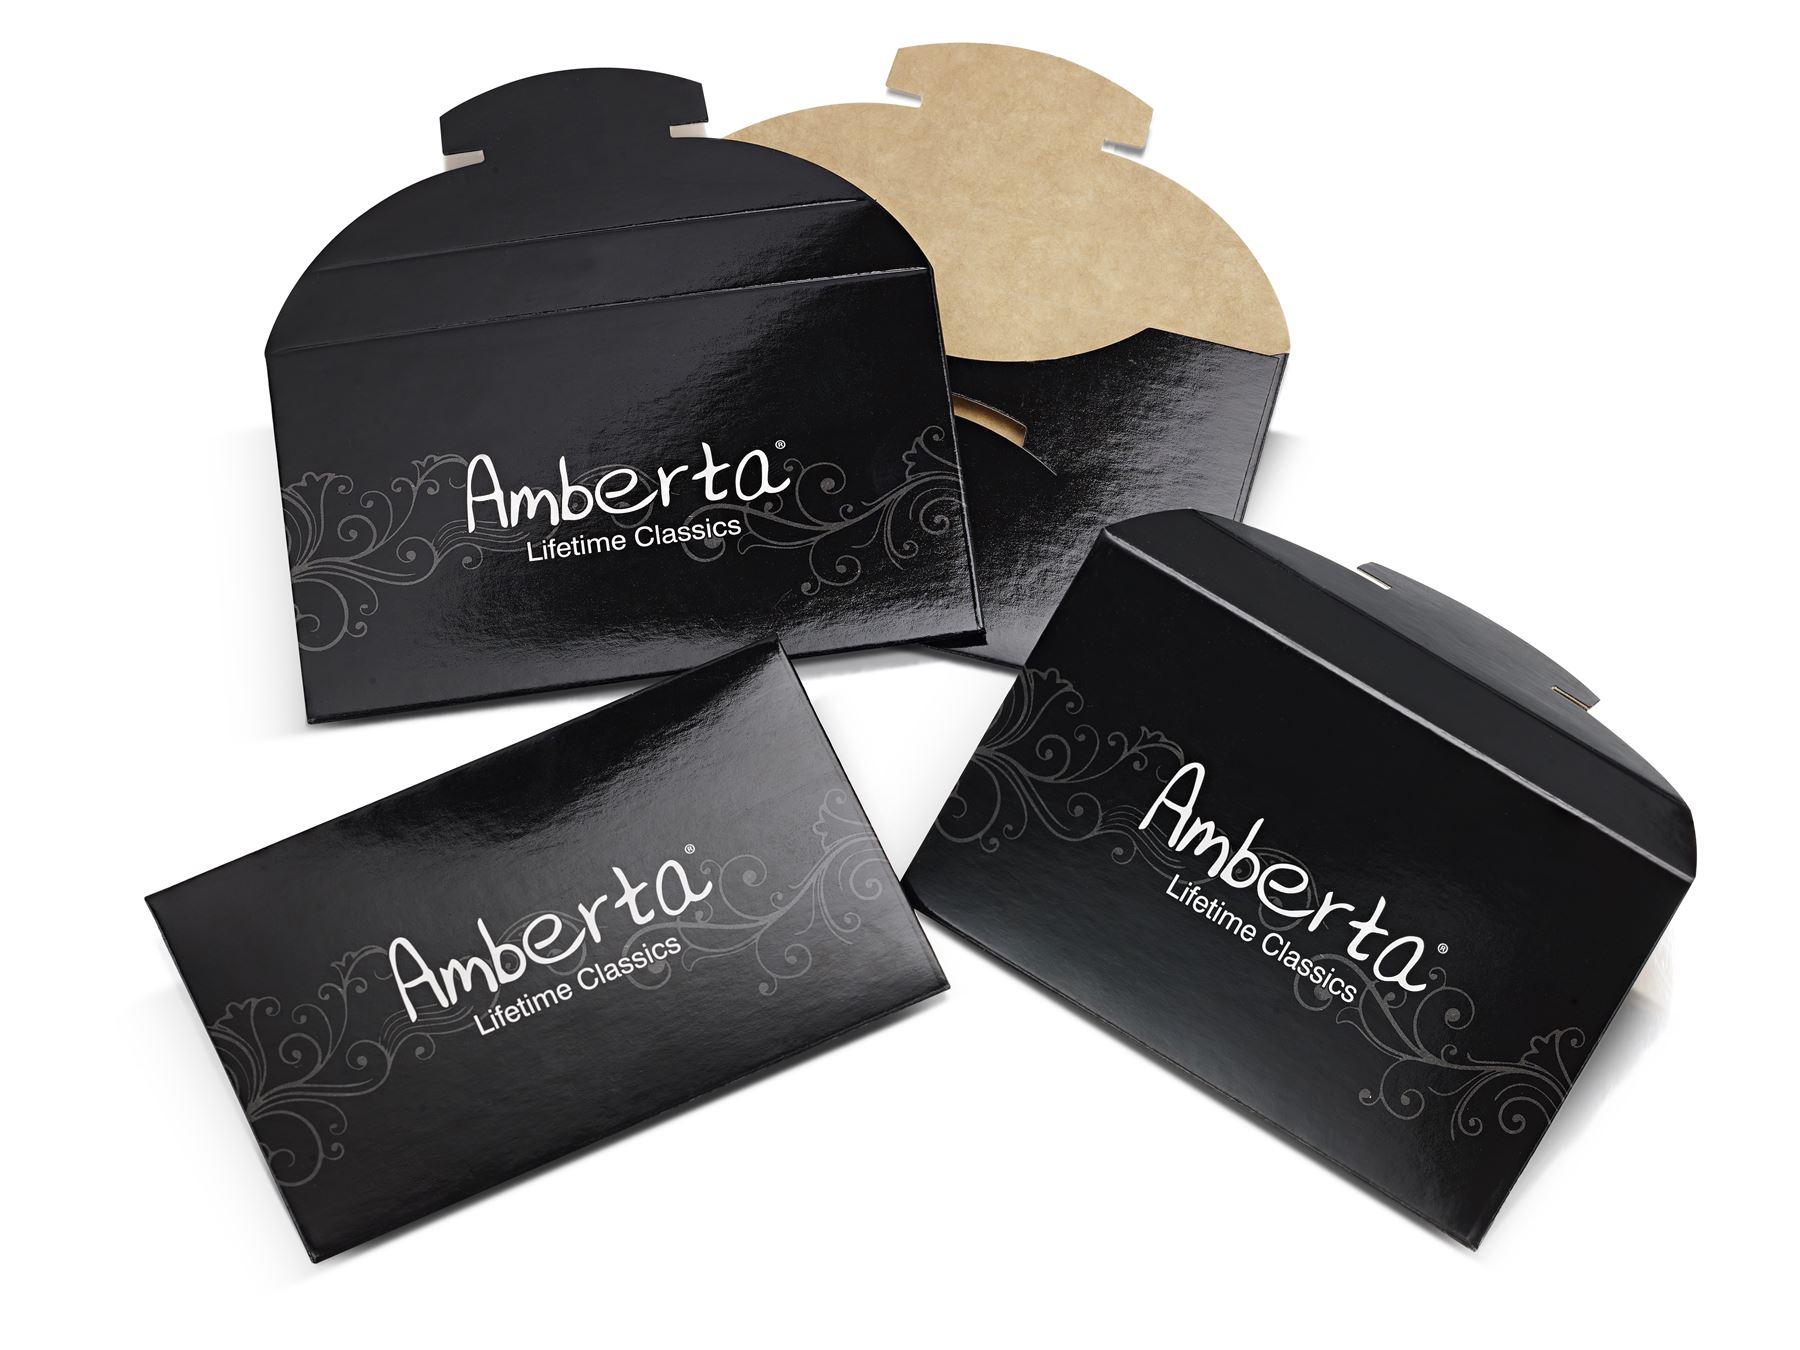 Amberta-Medallon-en-Fina-Plata-De-Ley-925-en-Formas-Diferentes-Para-Foto-y-Gemas miniatura 5